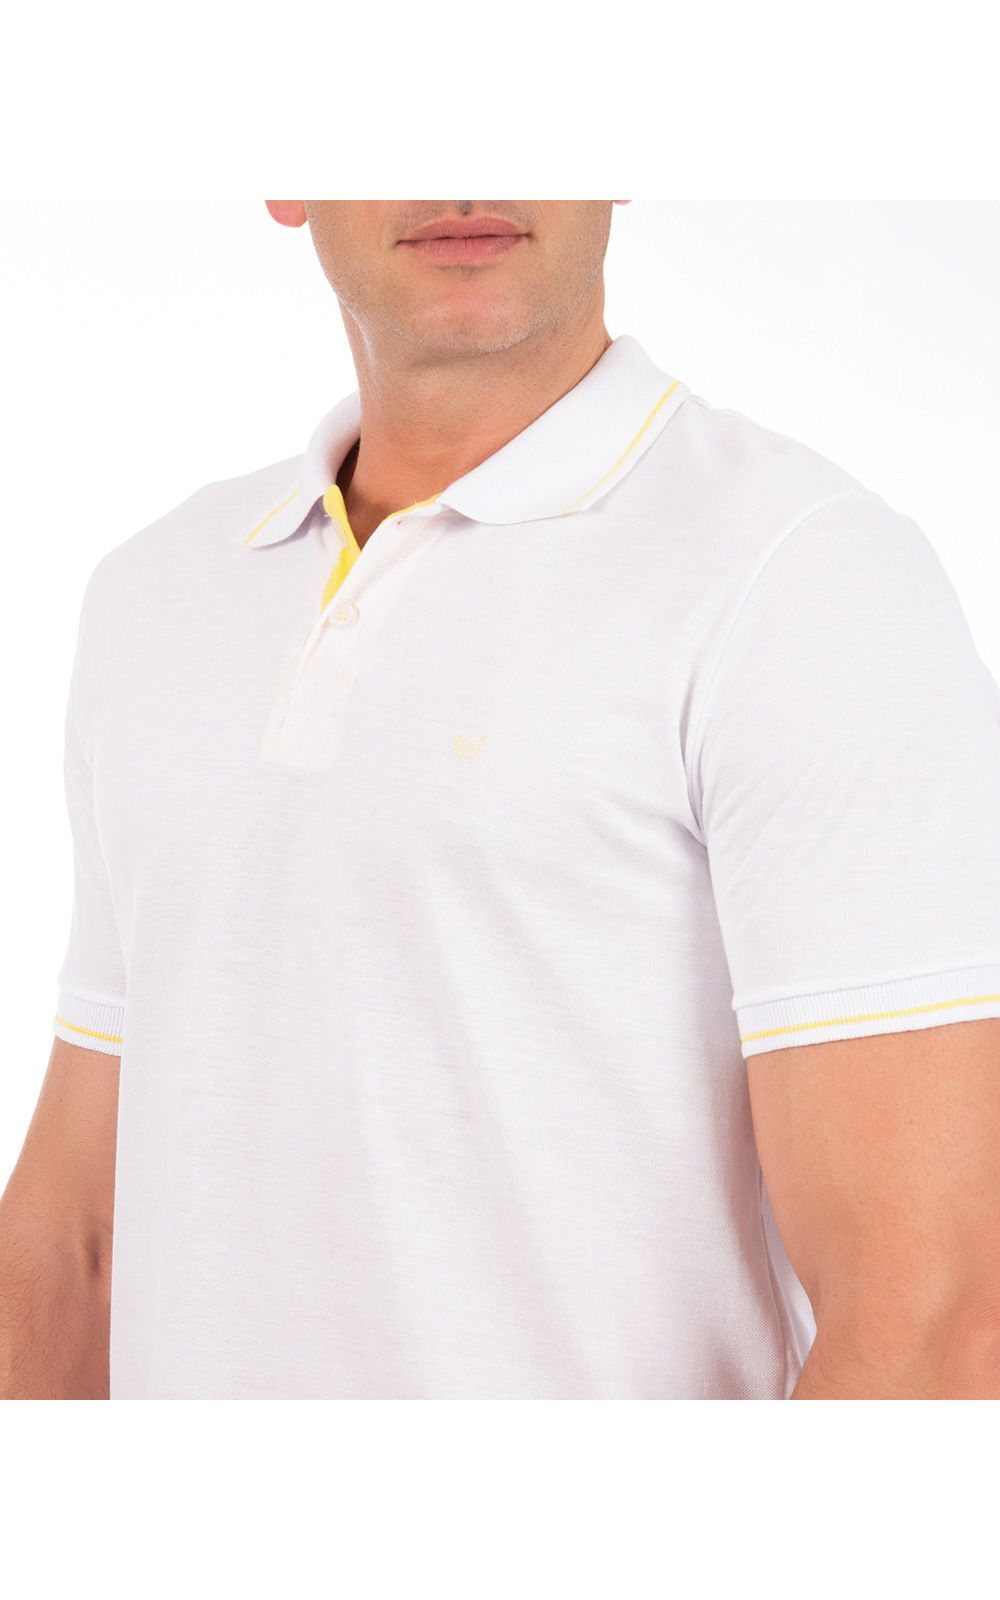 Foto 3 - Camisa Polo Masculina Branca Detalhada